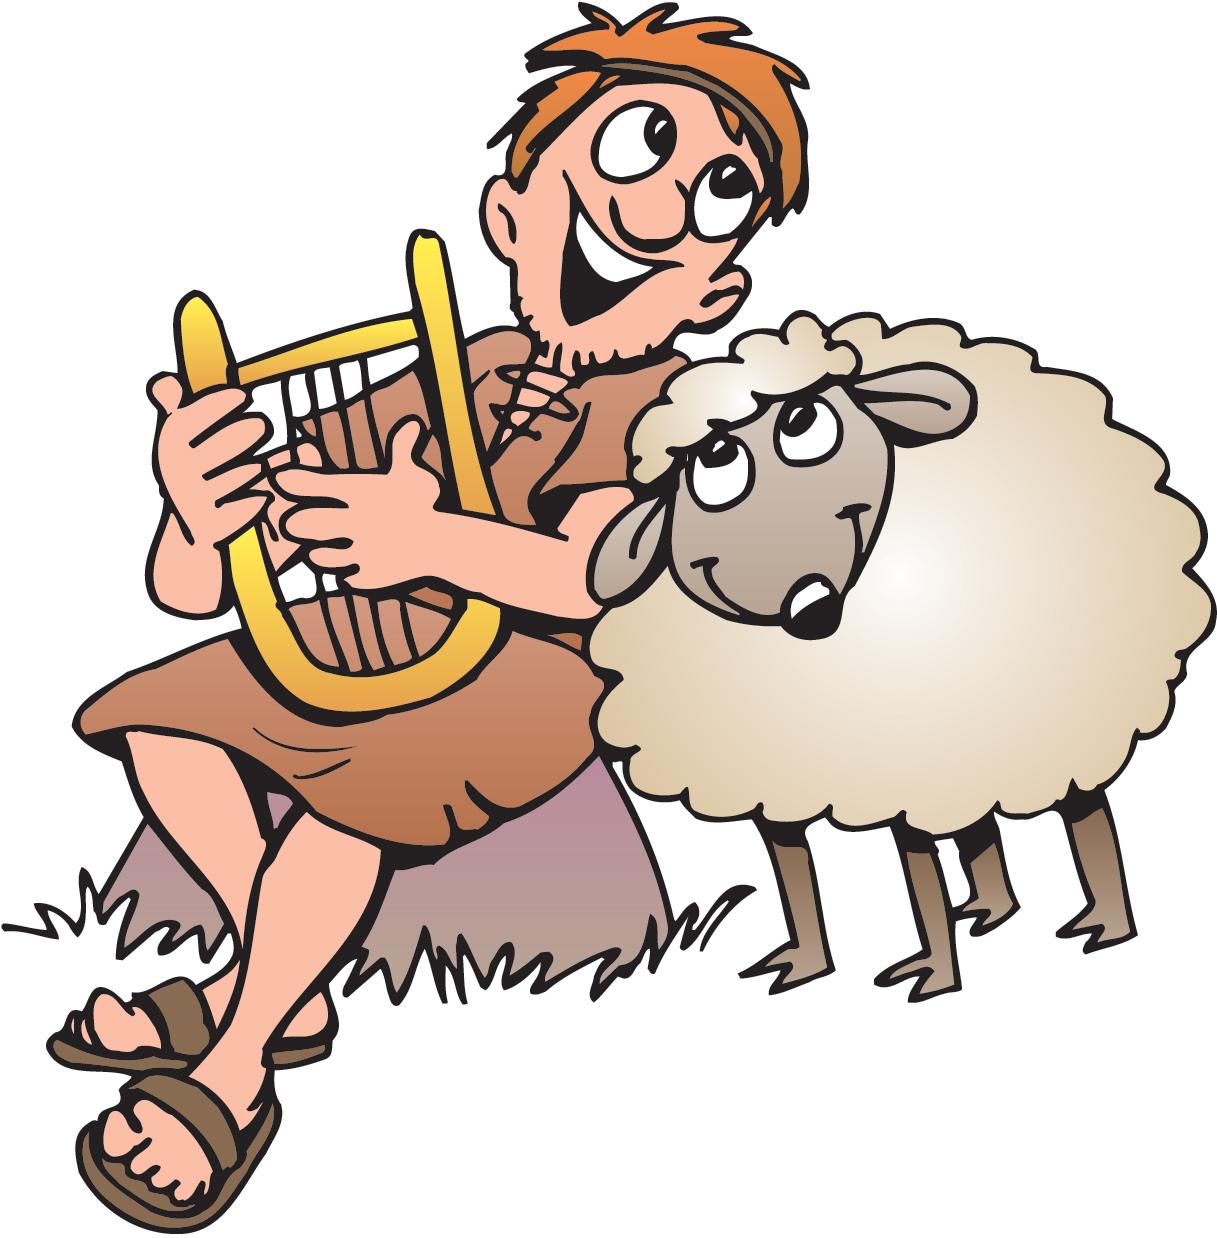 Cartoon shepherd clipart jpg royalty free stock Free Shepherd Cliparts, Download Free Clip Art, Free Clip Art on ... jpg royalty free stock